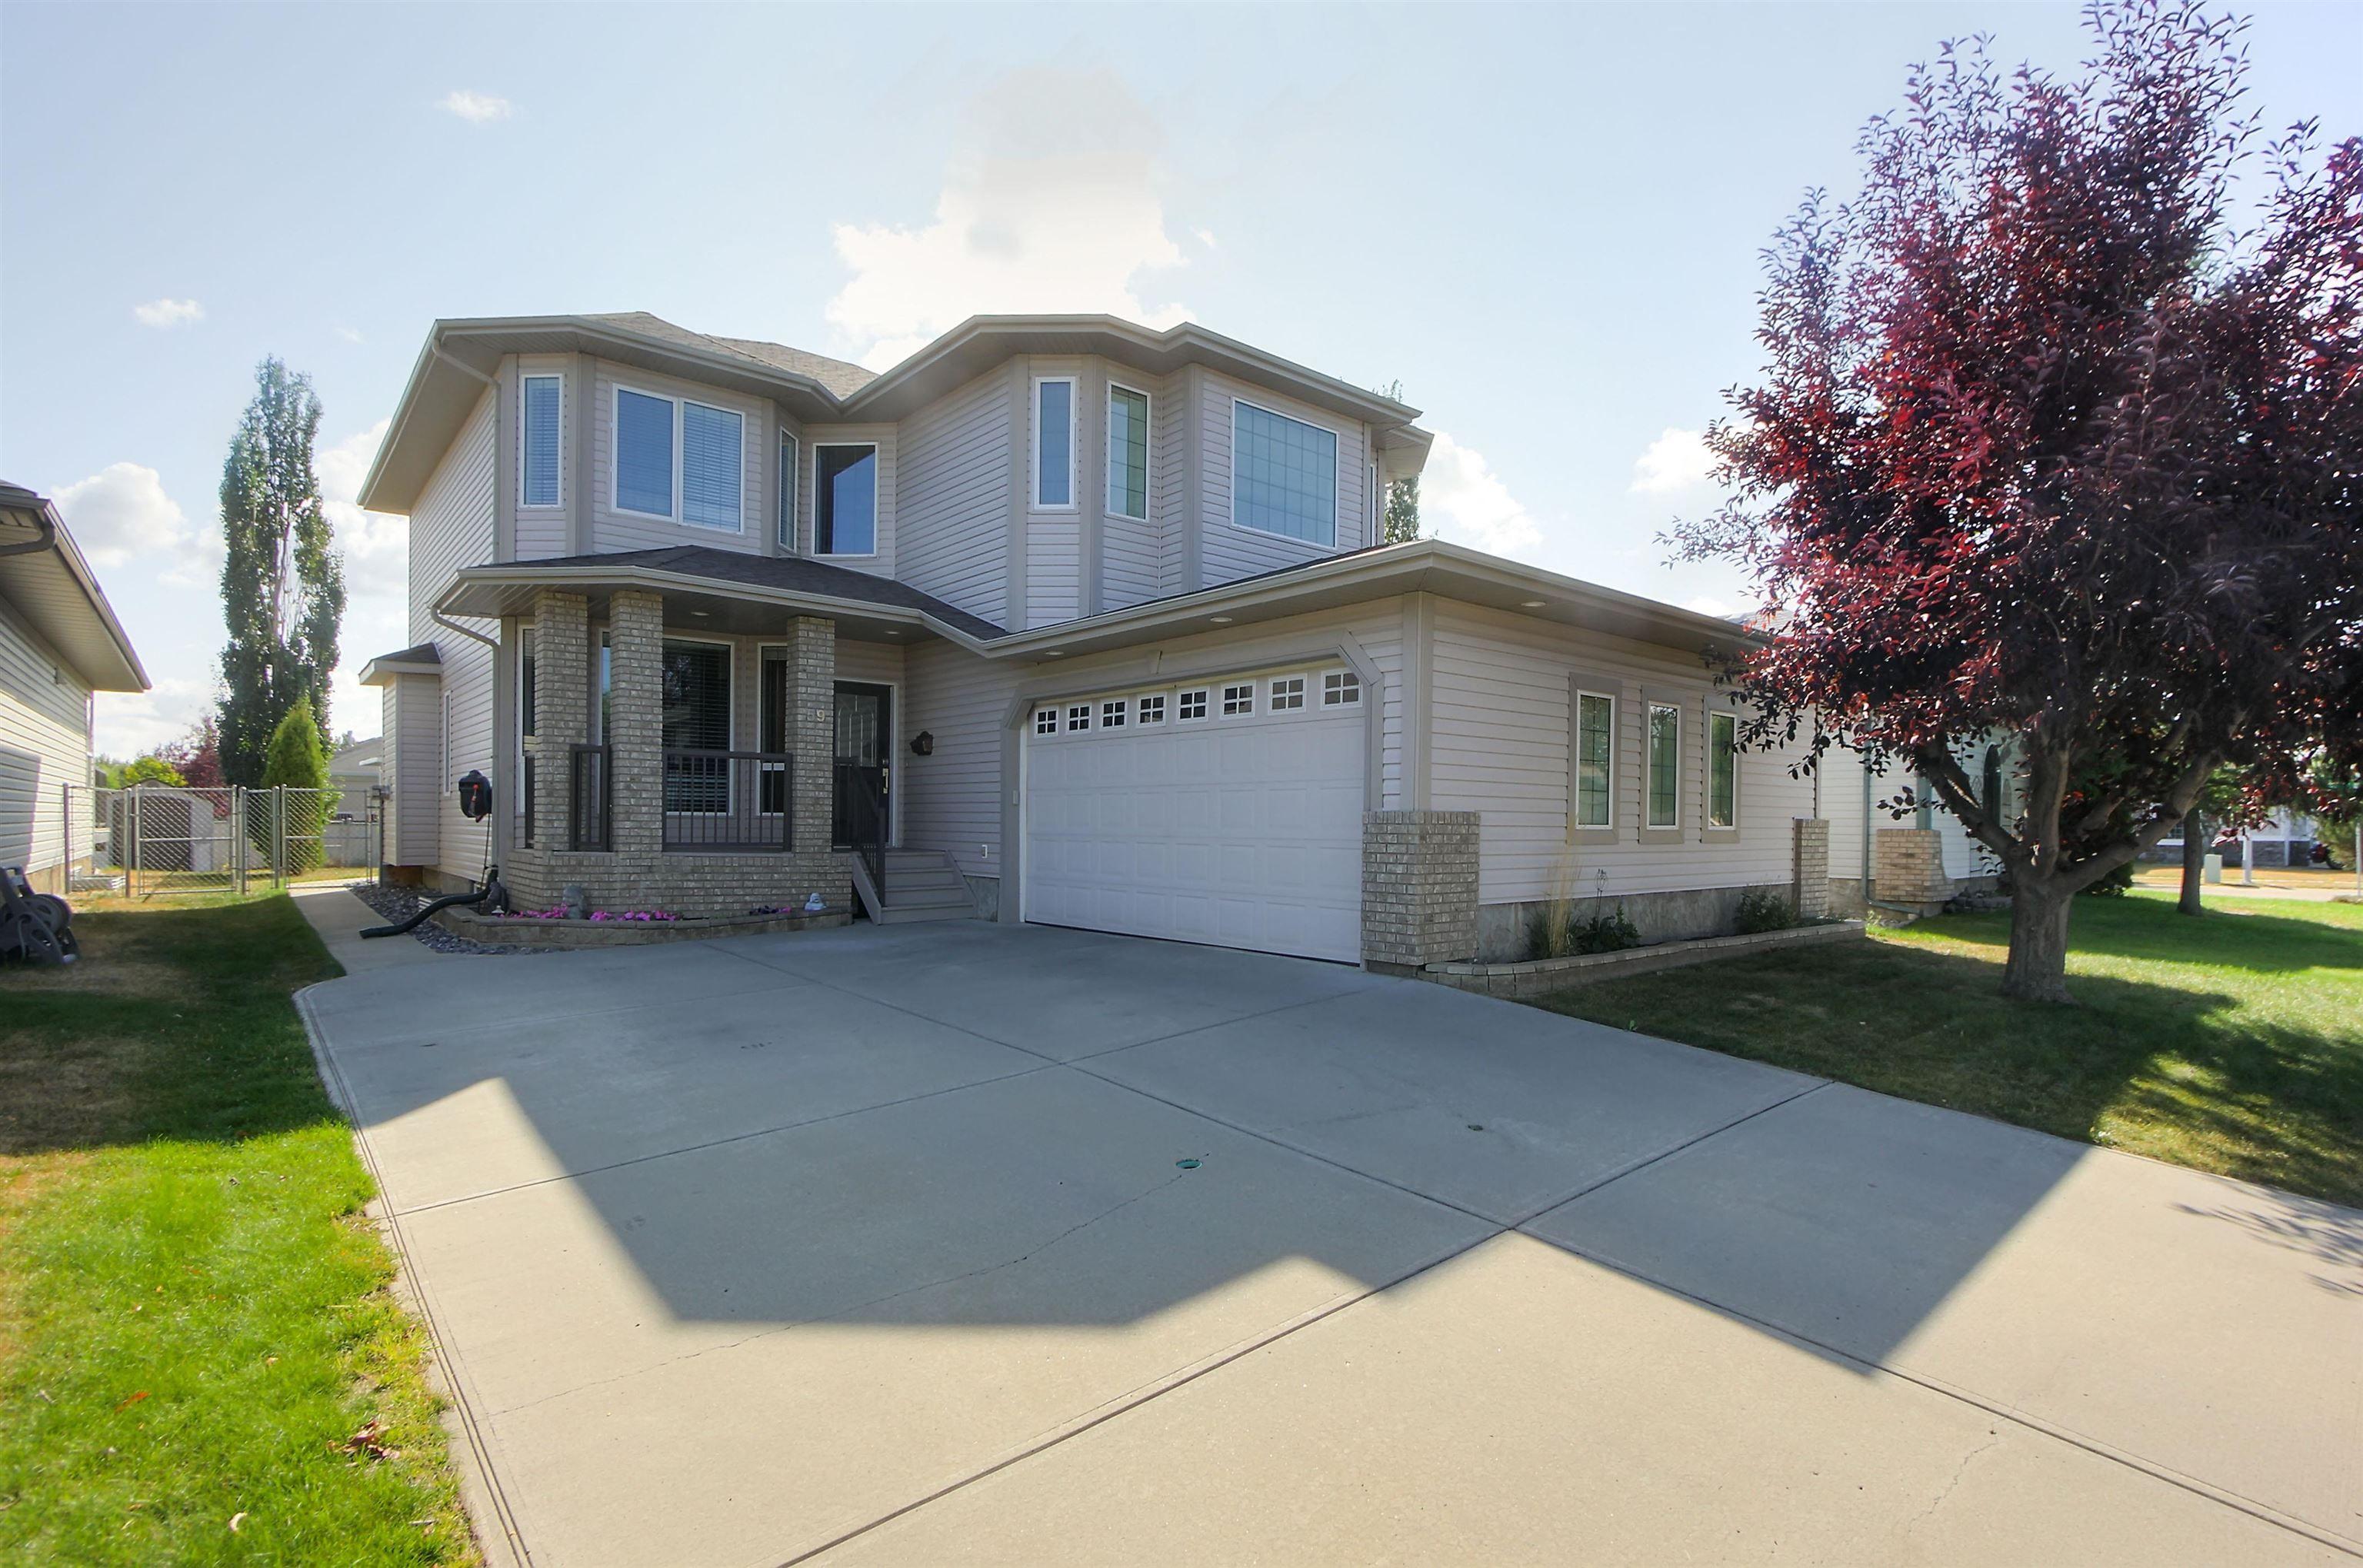 Main Photo: 59 FAIRWAY Drive: Spruce Grove House for sale : MLS®# E4260170